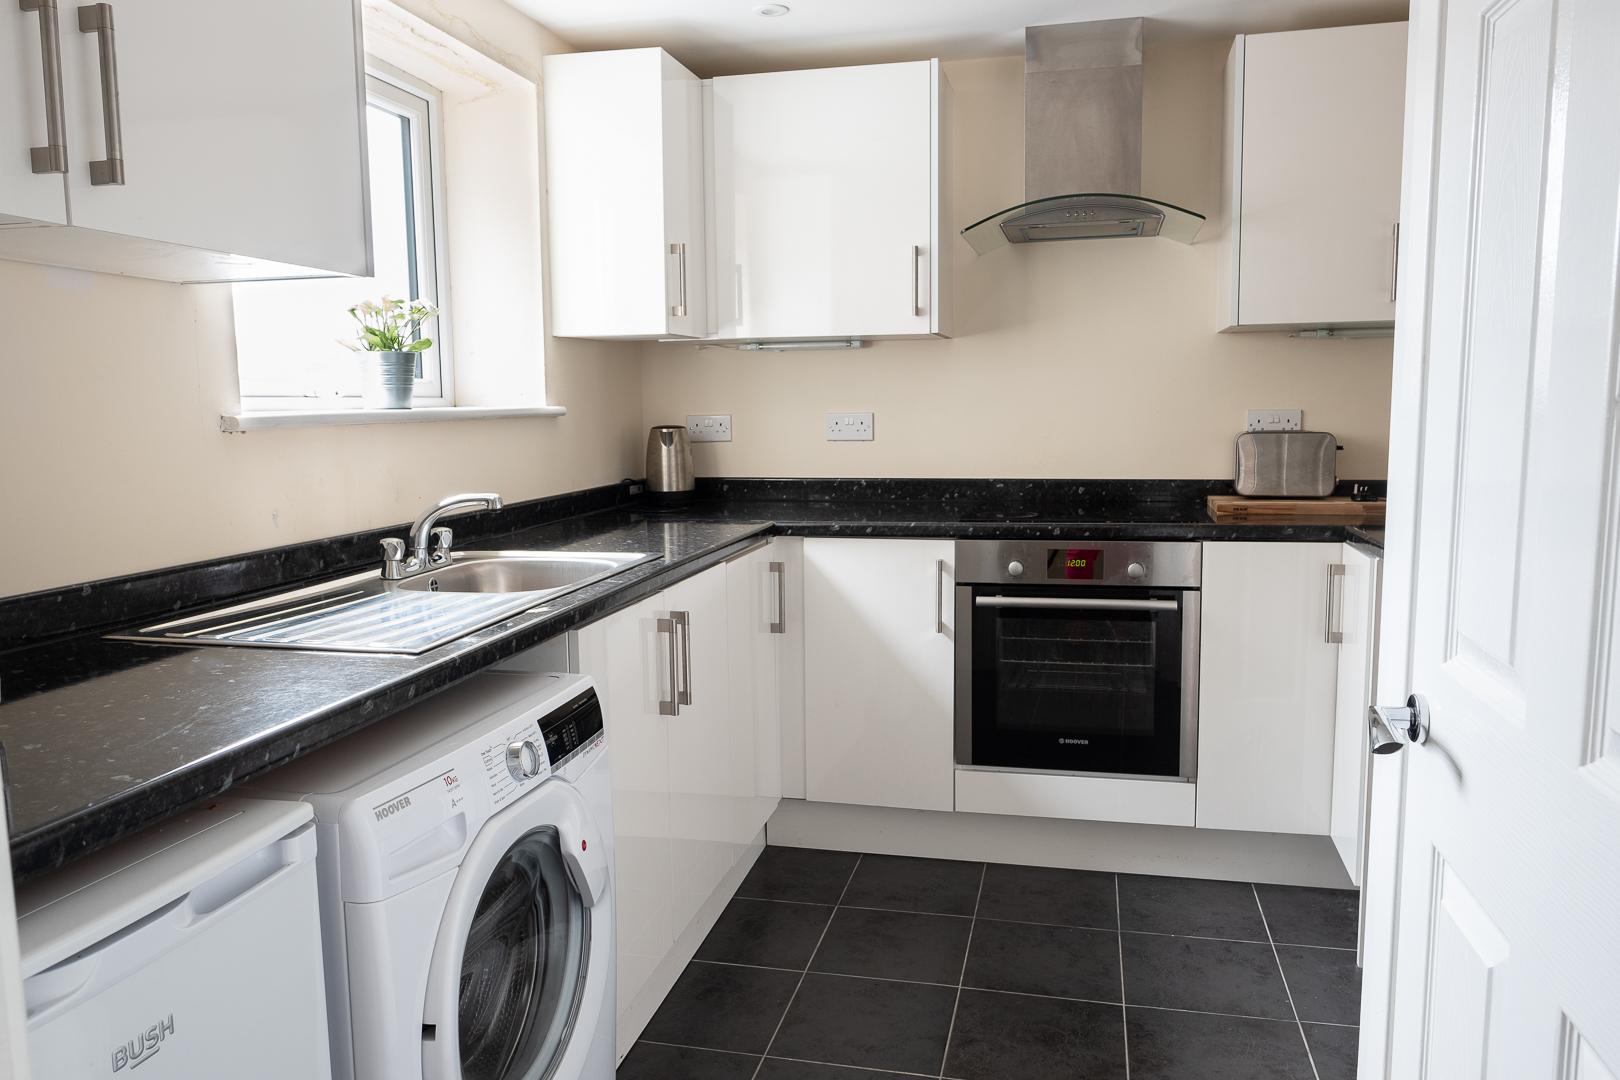 Kitchen at Broadwalk Apartment, Centre, Crawley